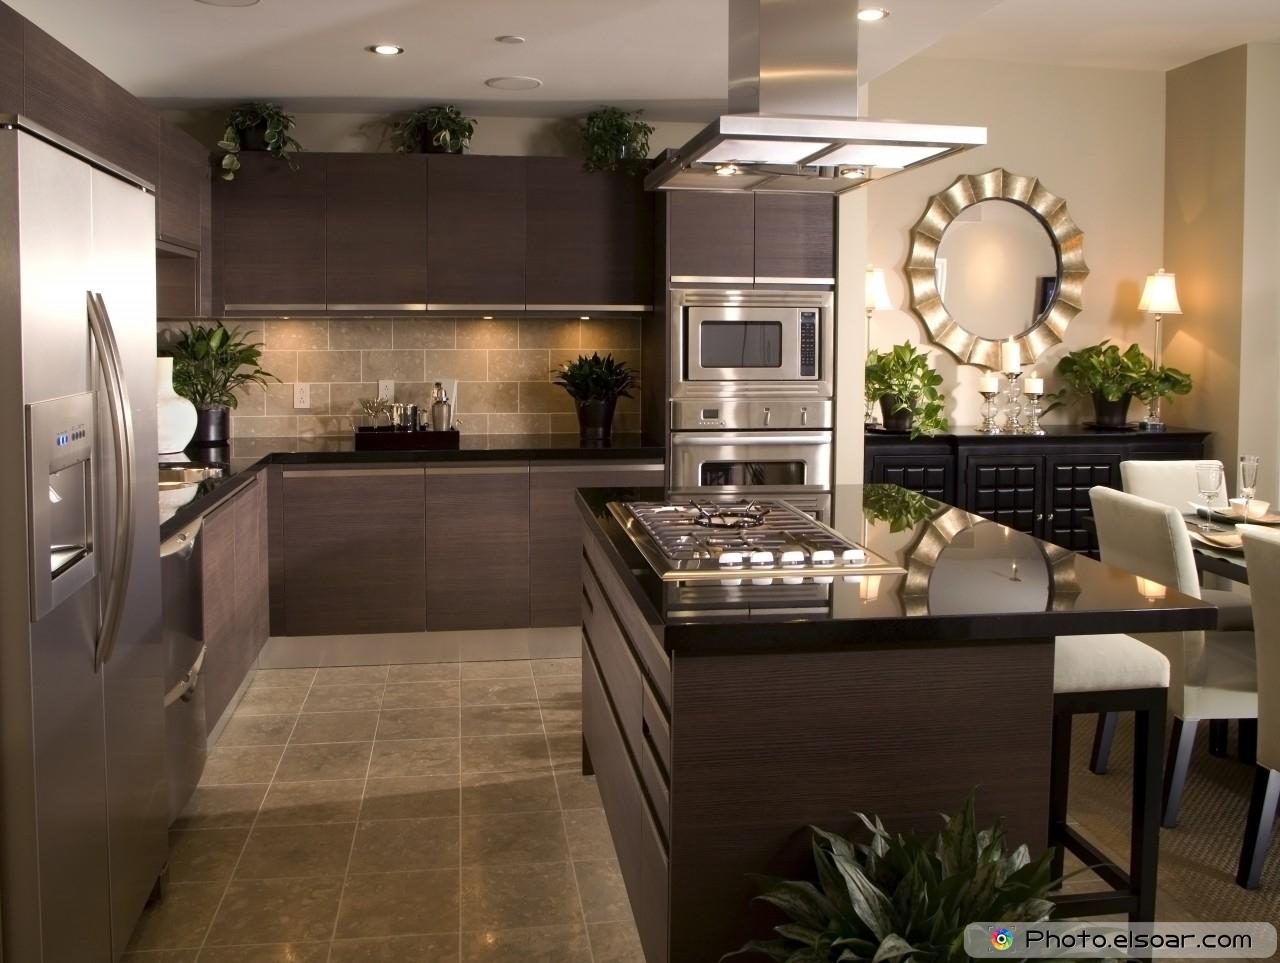 Kitchen Interior Design With Tiled